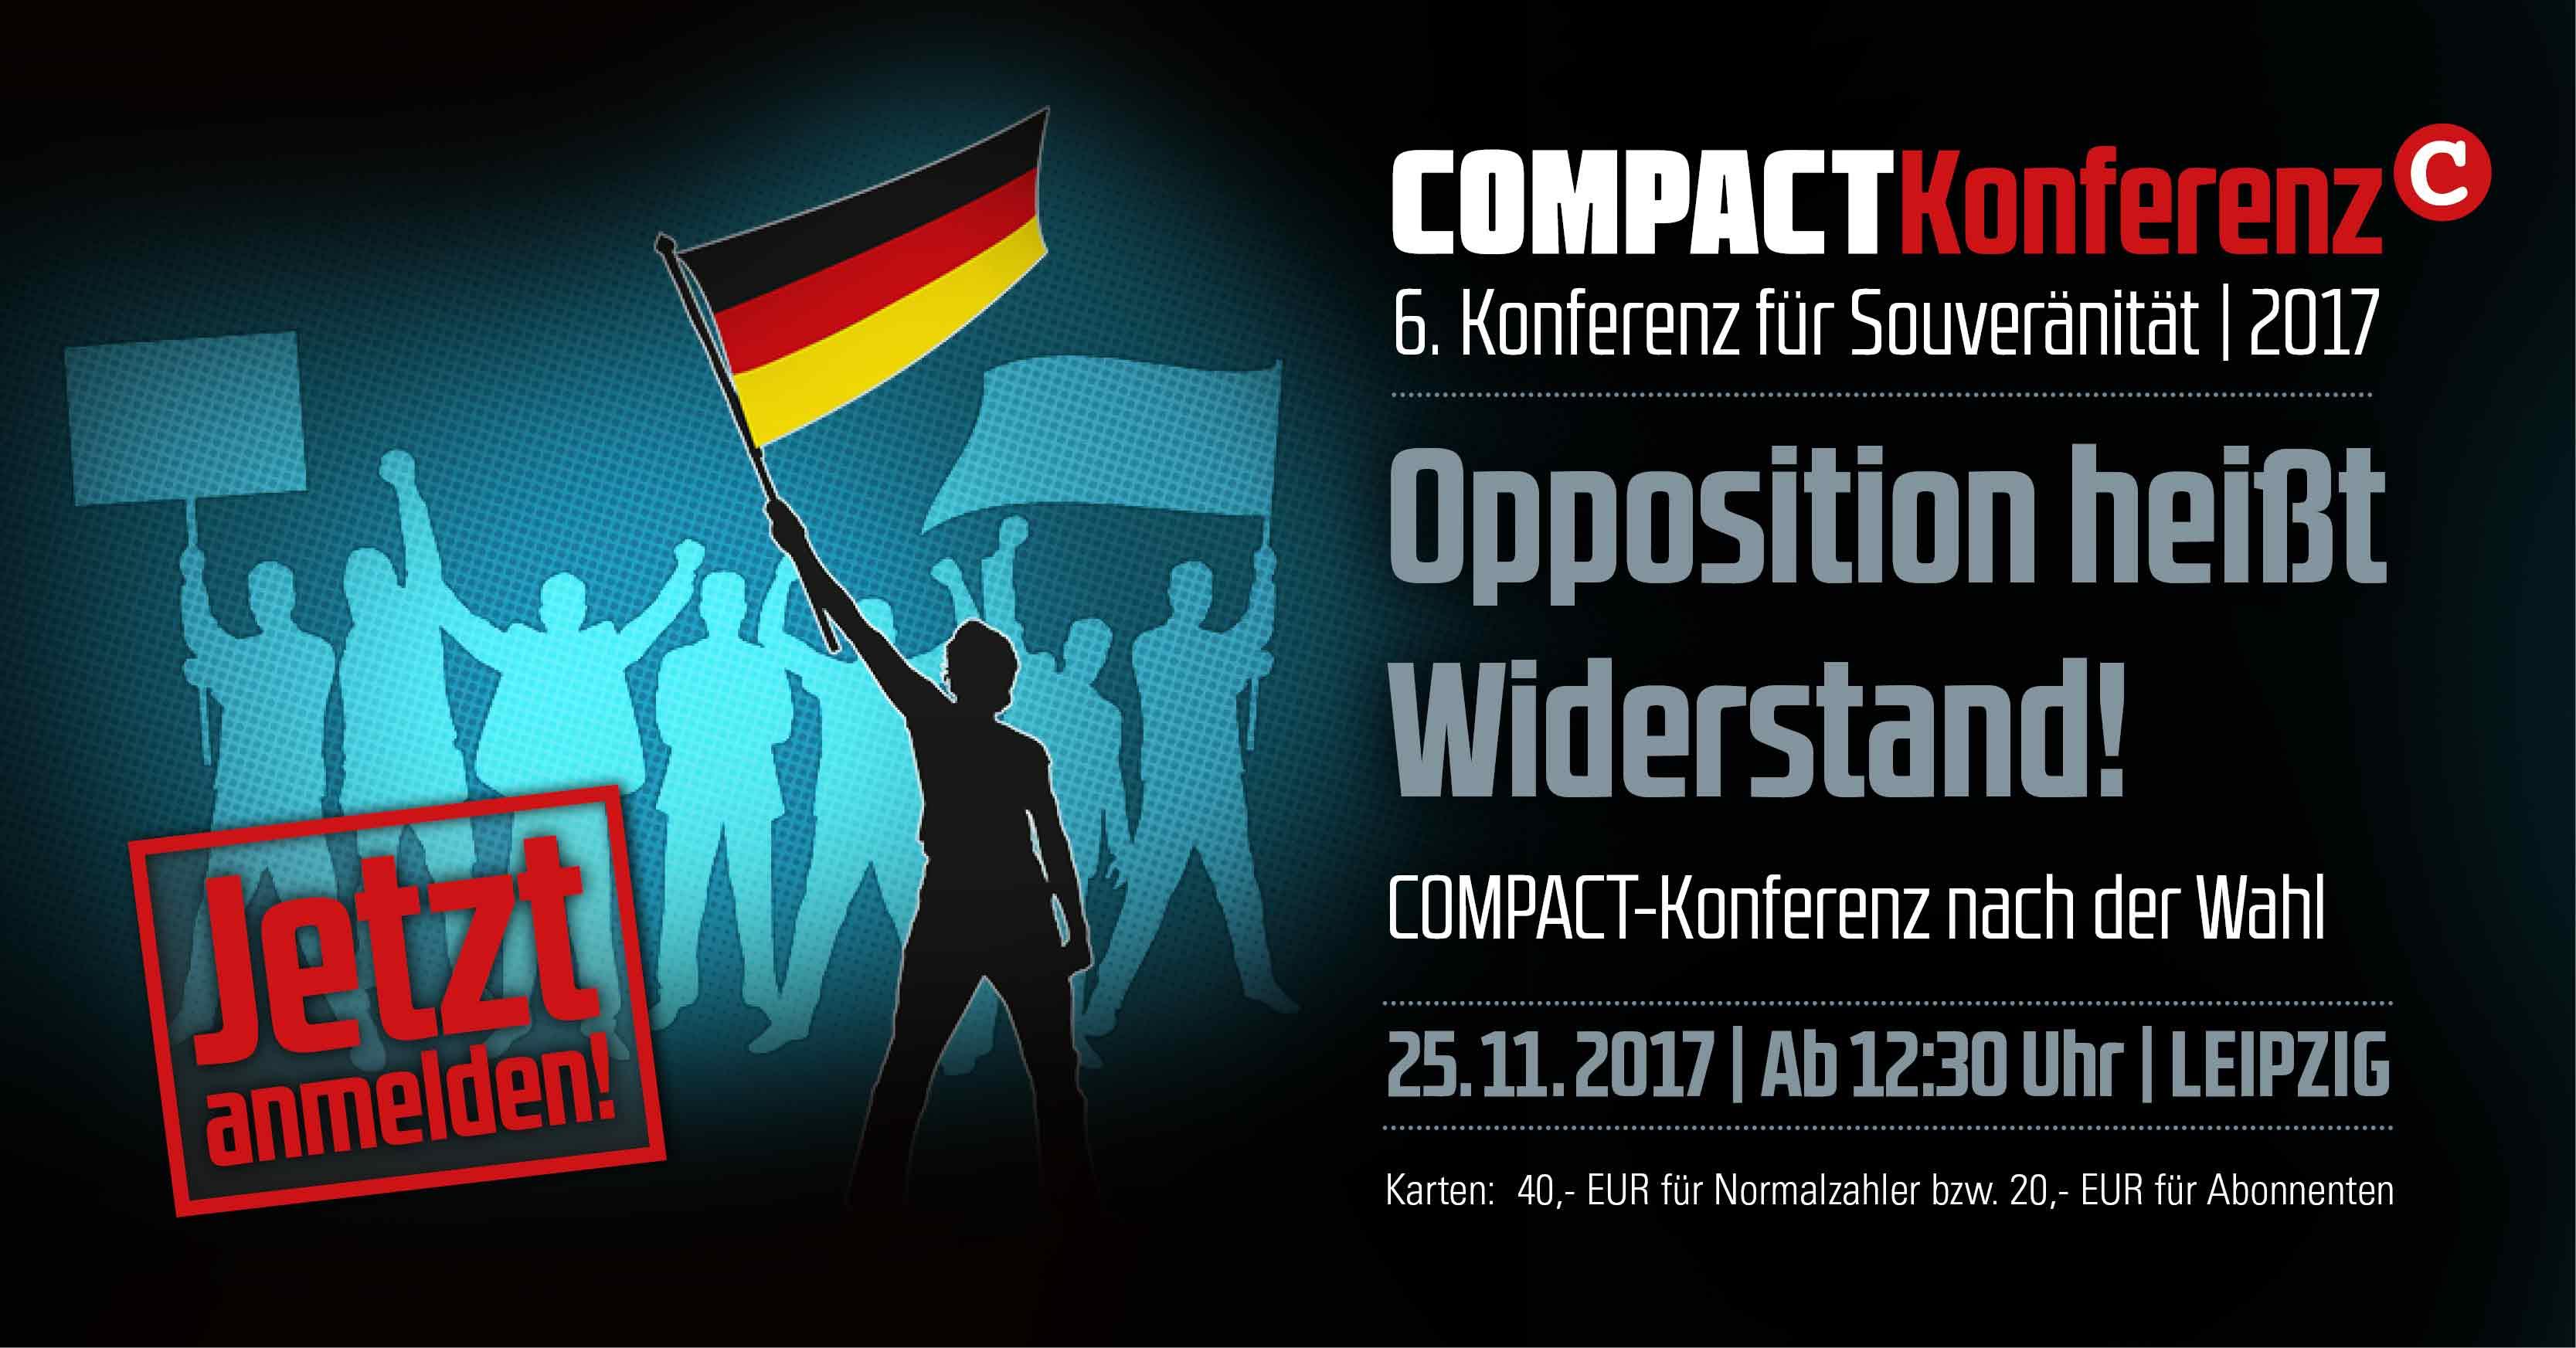 6. COMPACT-Konferenz für Souveränität 2017